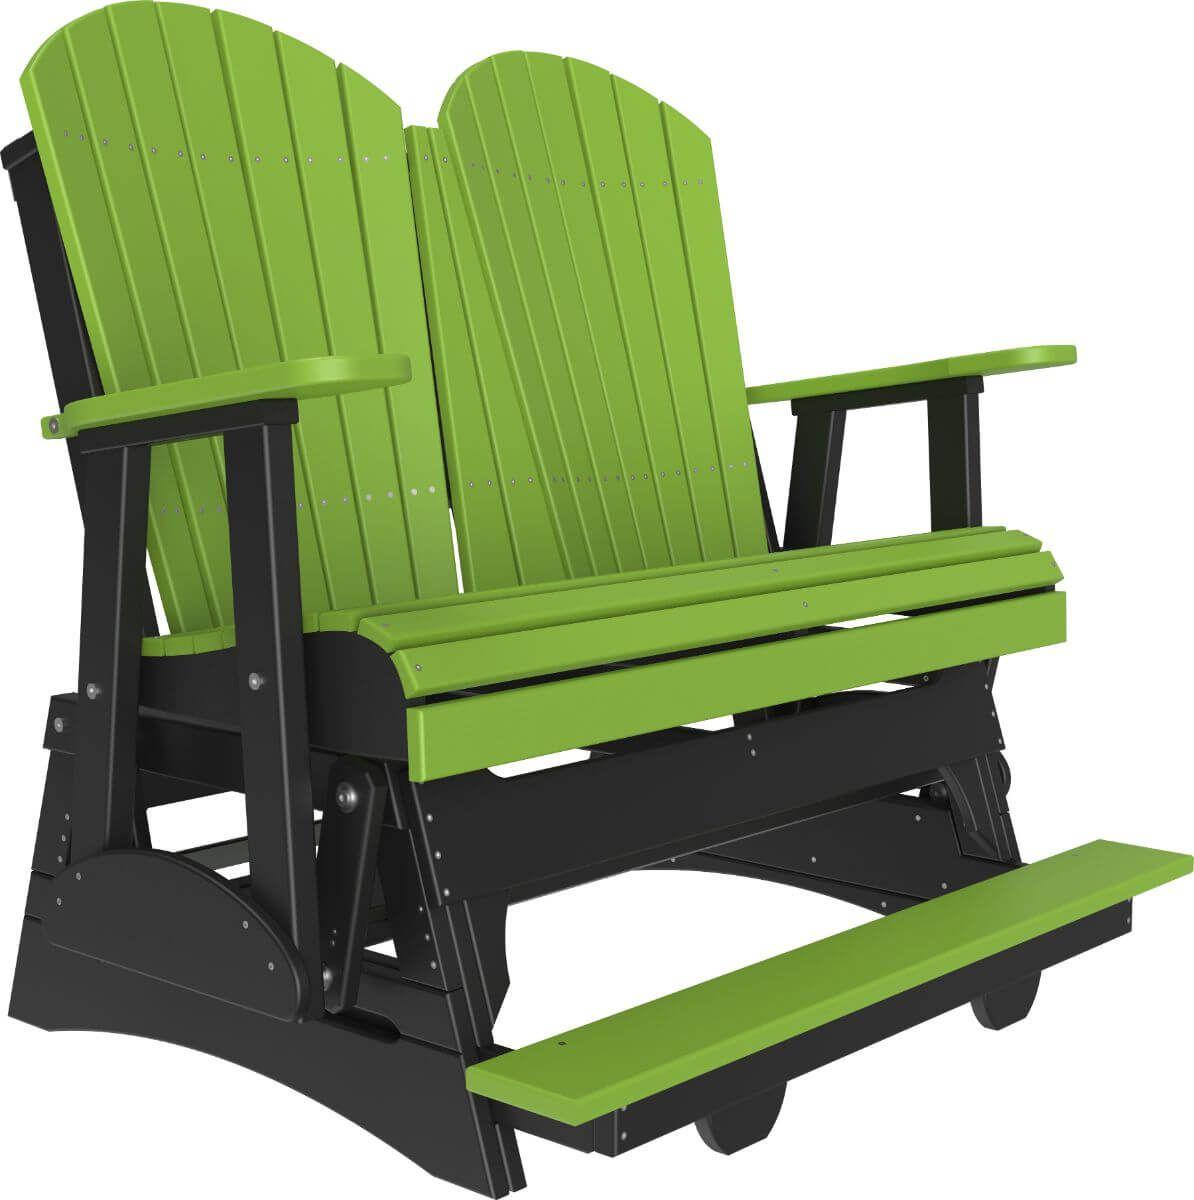 Lime Green and Black Tahiti Loveseat Balcony Glider